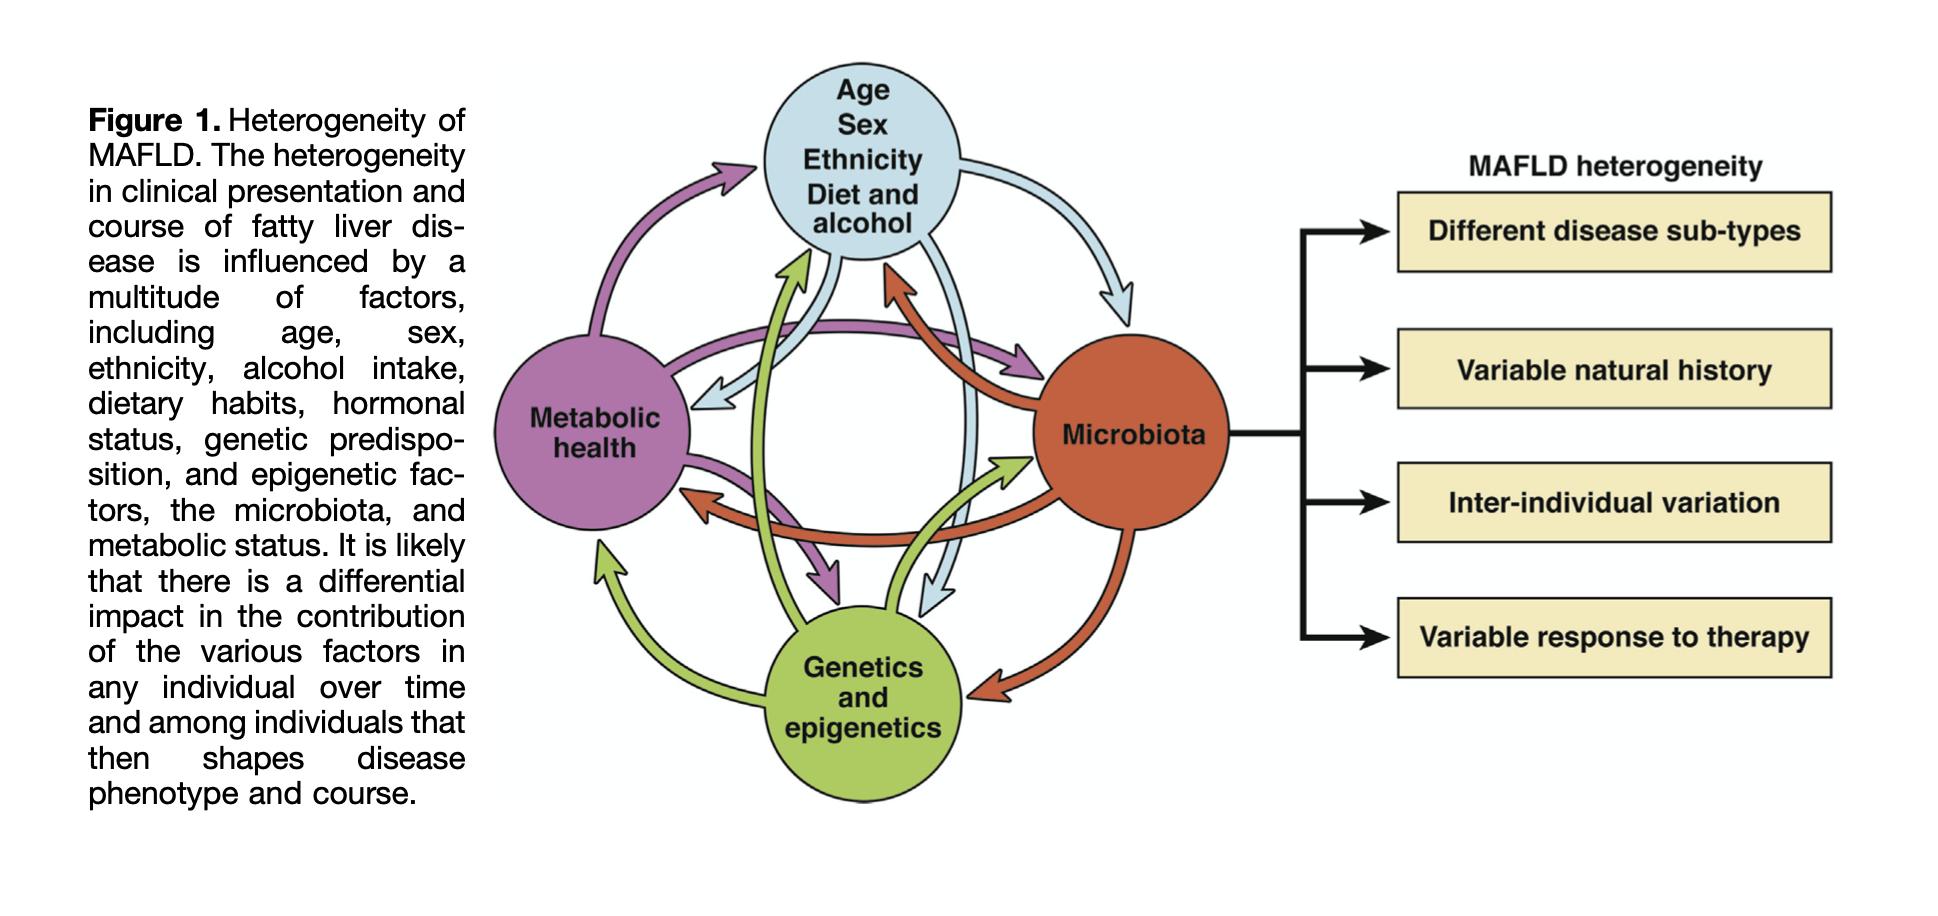 "Eslam, Mohammed, Arun J. Sanyal, Jacob George, Arun Sanyal, Brent Neuschwander-Tetri, Claudio Tiribelli, David E. Kleiner, et al. ""MAFLD: A Consensus-Driven Proposed Nomenclature for Metabolic Associated Fatty Liver Disease.""  Gastroenterology  158, no. 7 (May 2020): 1999-2014.e1.  https://doi.org/10.1053/j.gastro.2019.11.312 ."